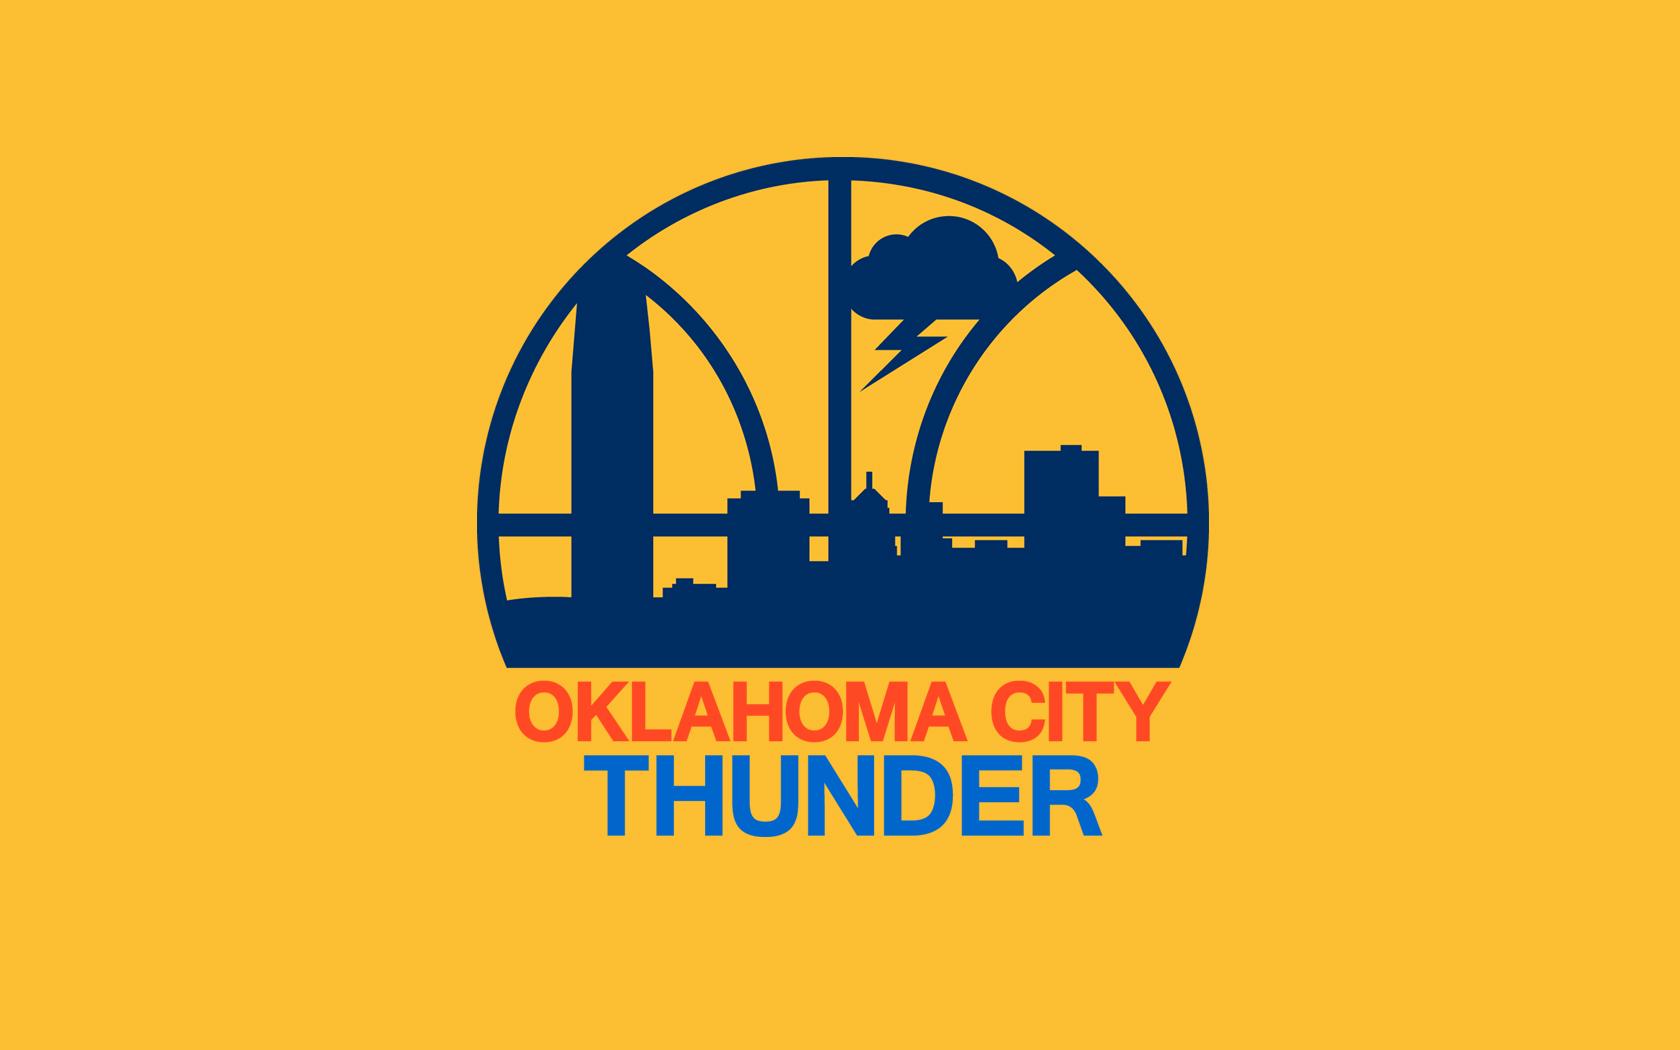 oklahoma city thunder wallpaper for iphone 5